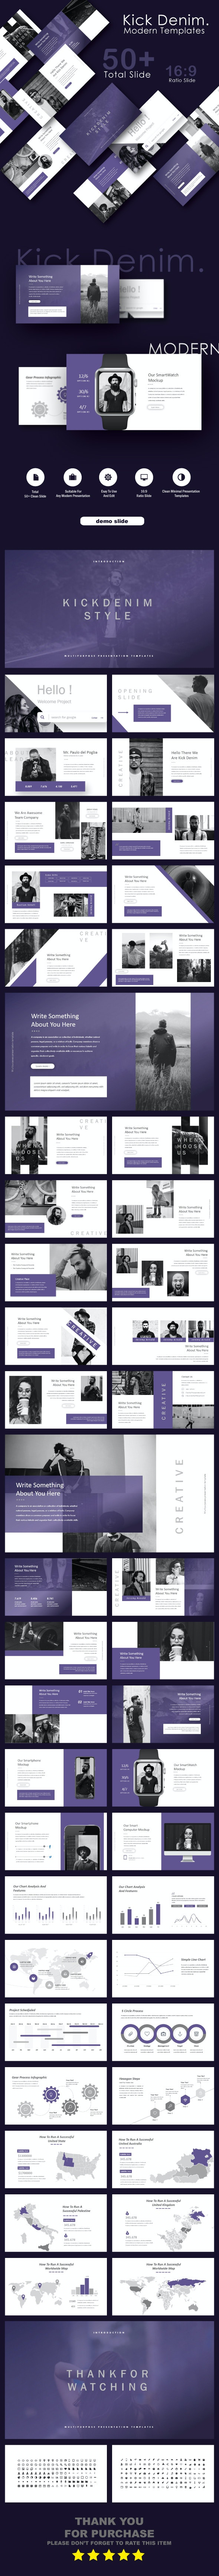 KickDenim Multipurpose Google Slide Templates - Creative PowerPoint Templates